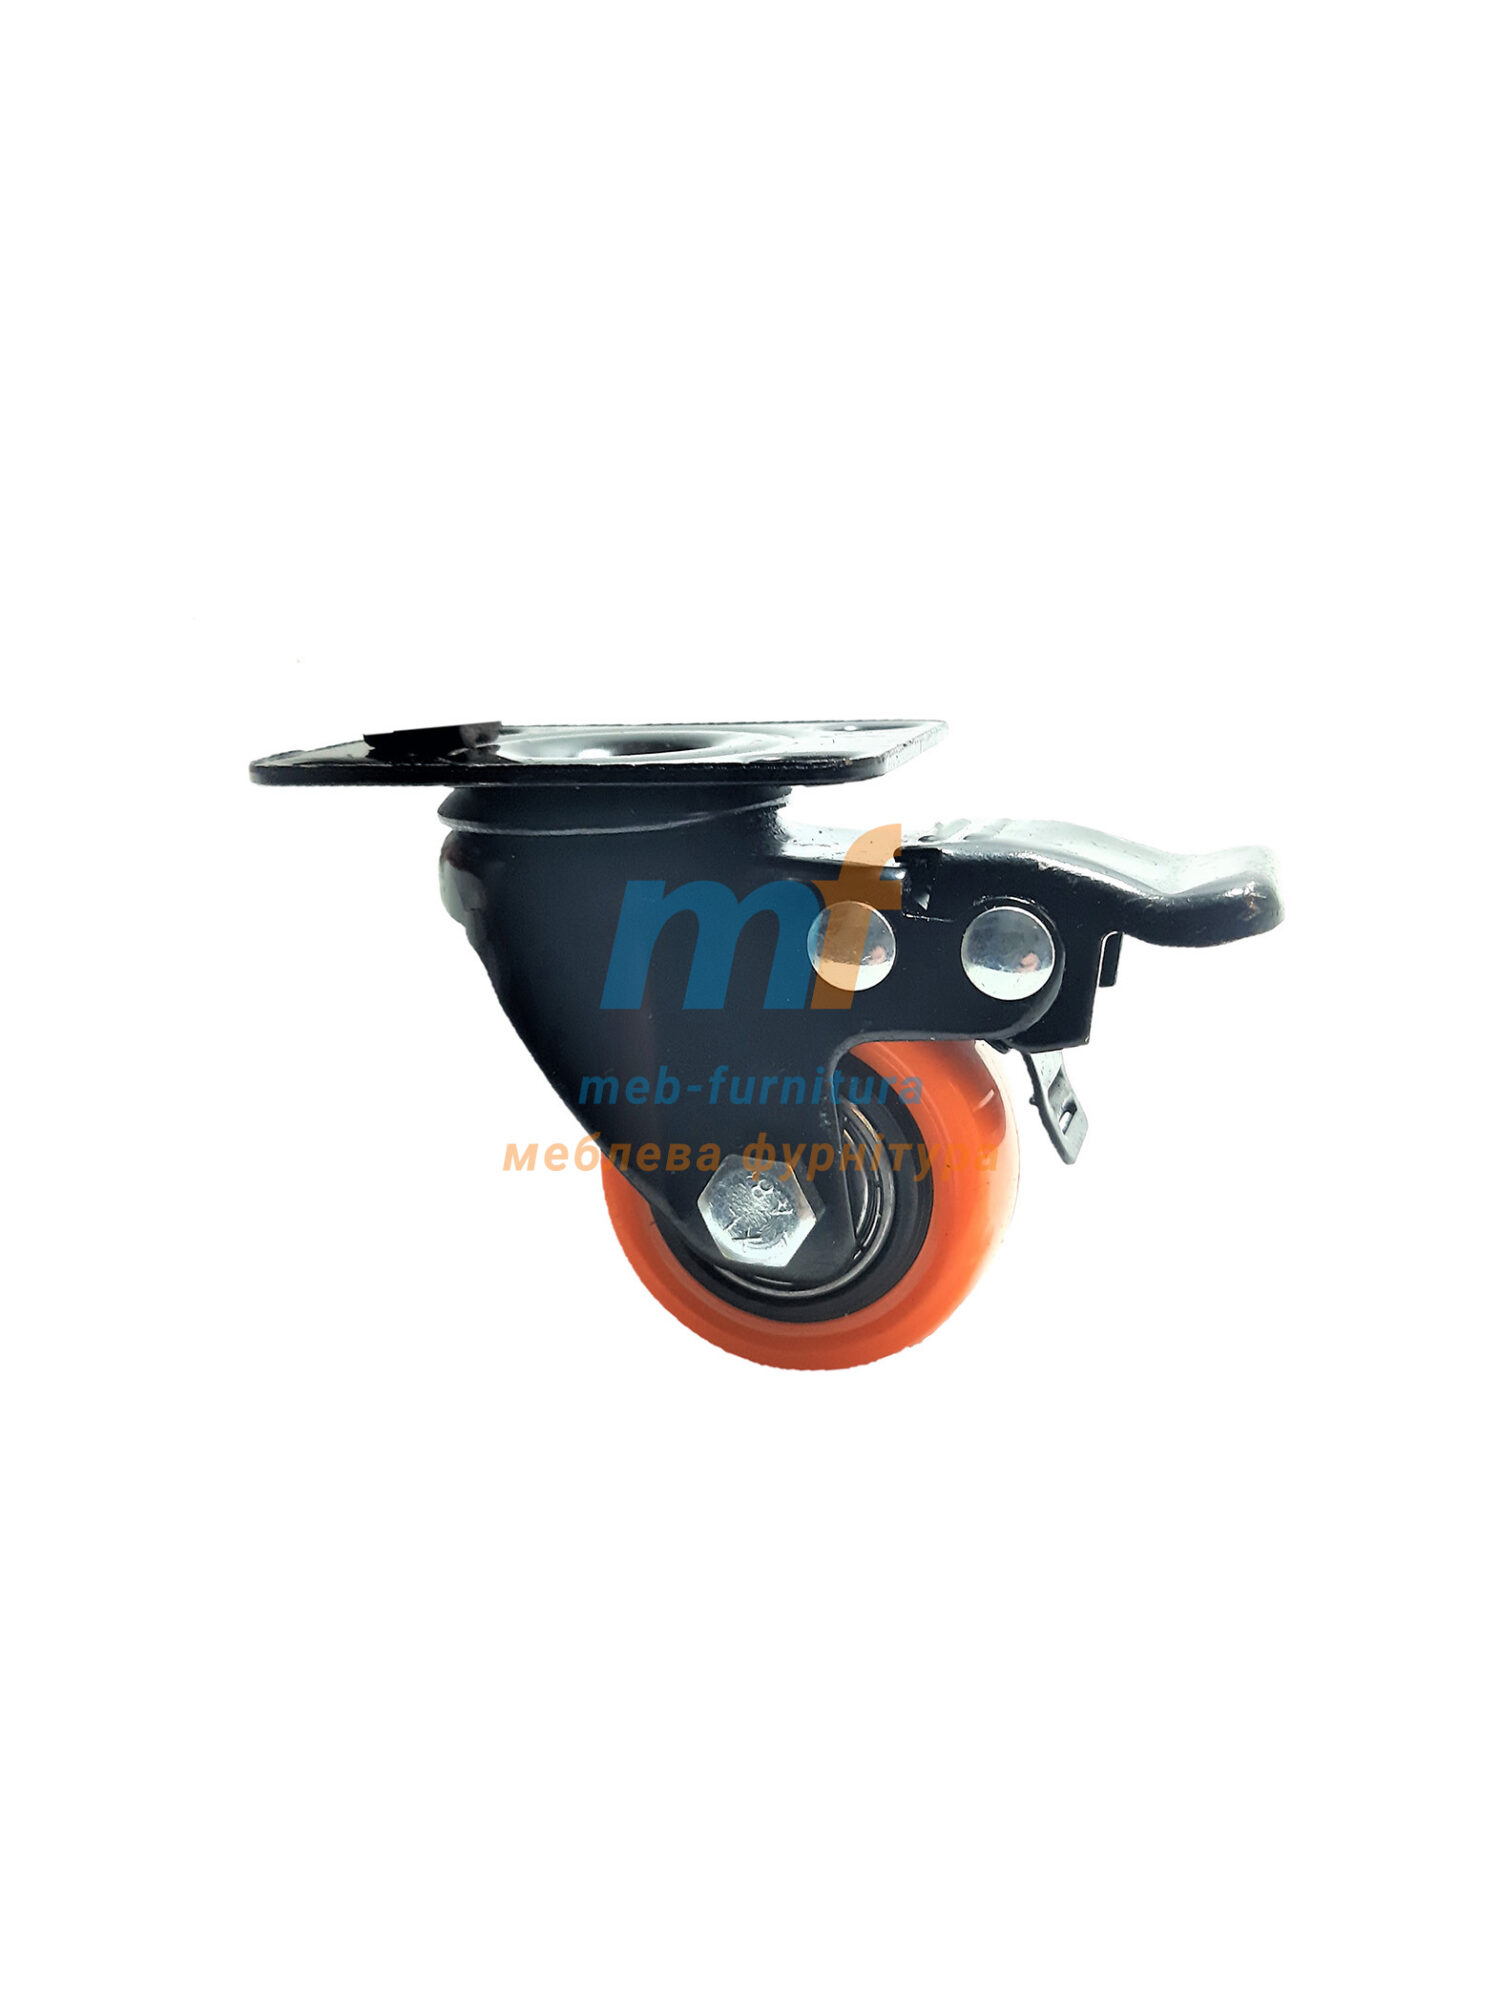 Колесо резина на платформе с фиксатором 40мм (3-001)